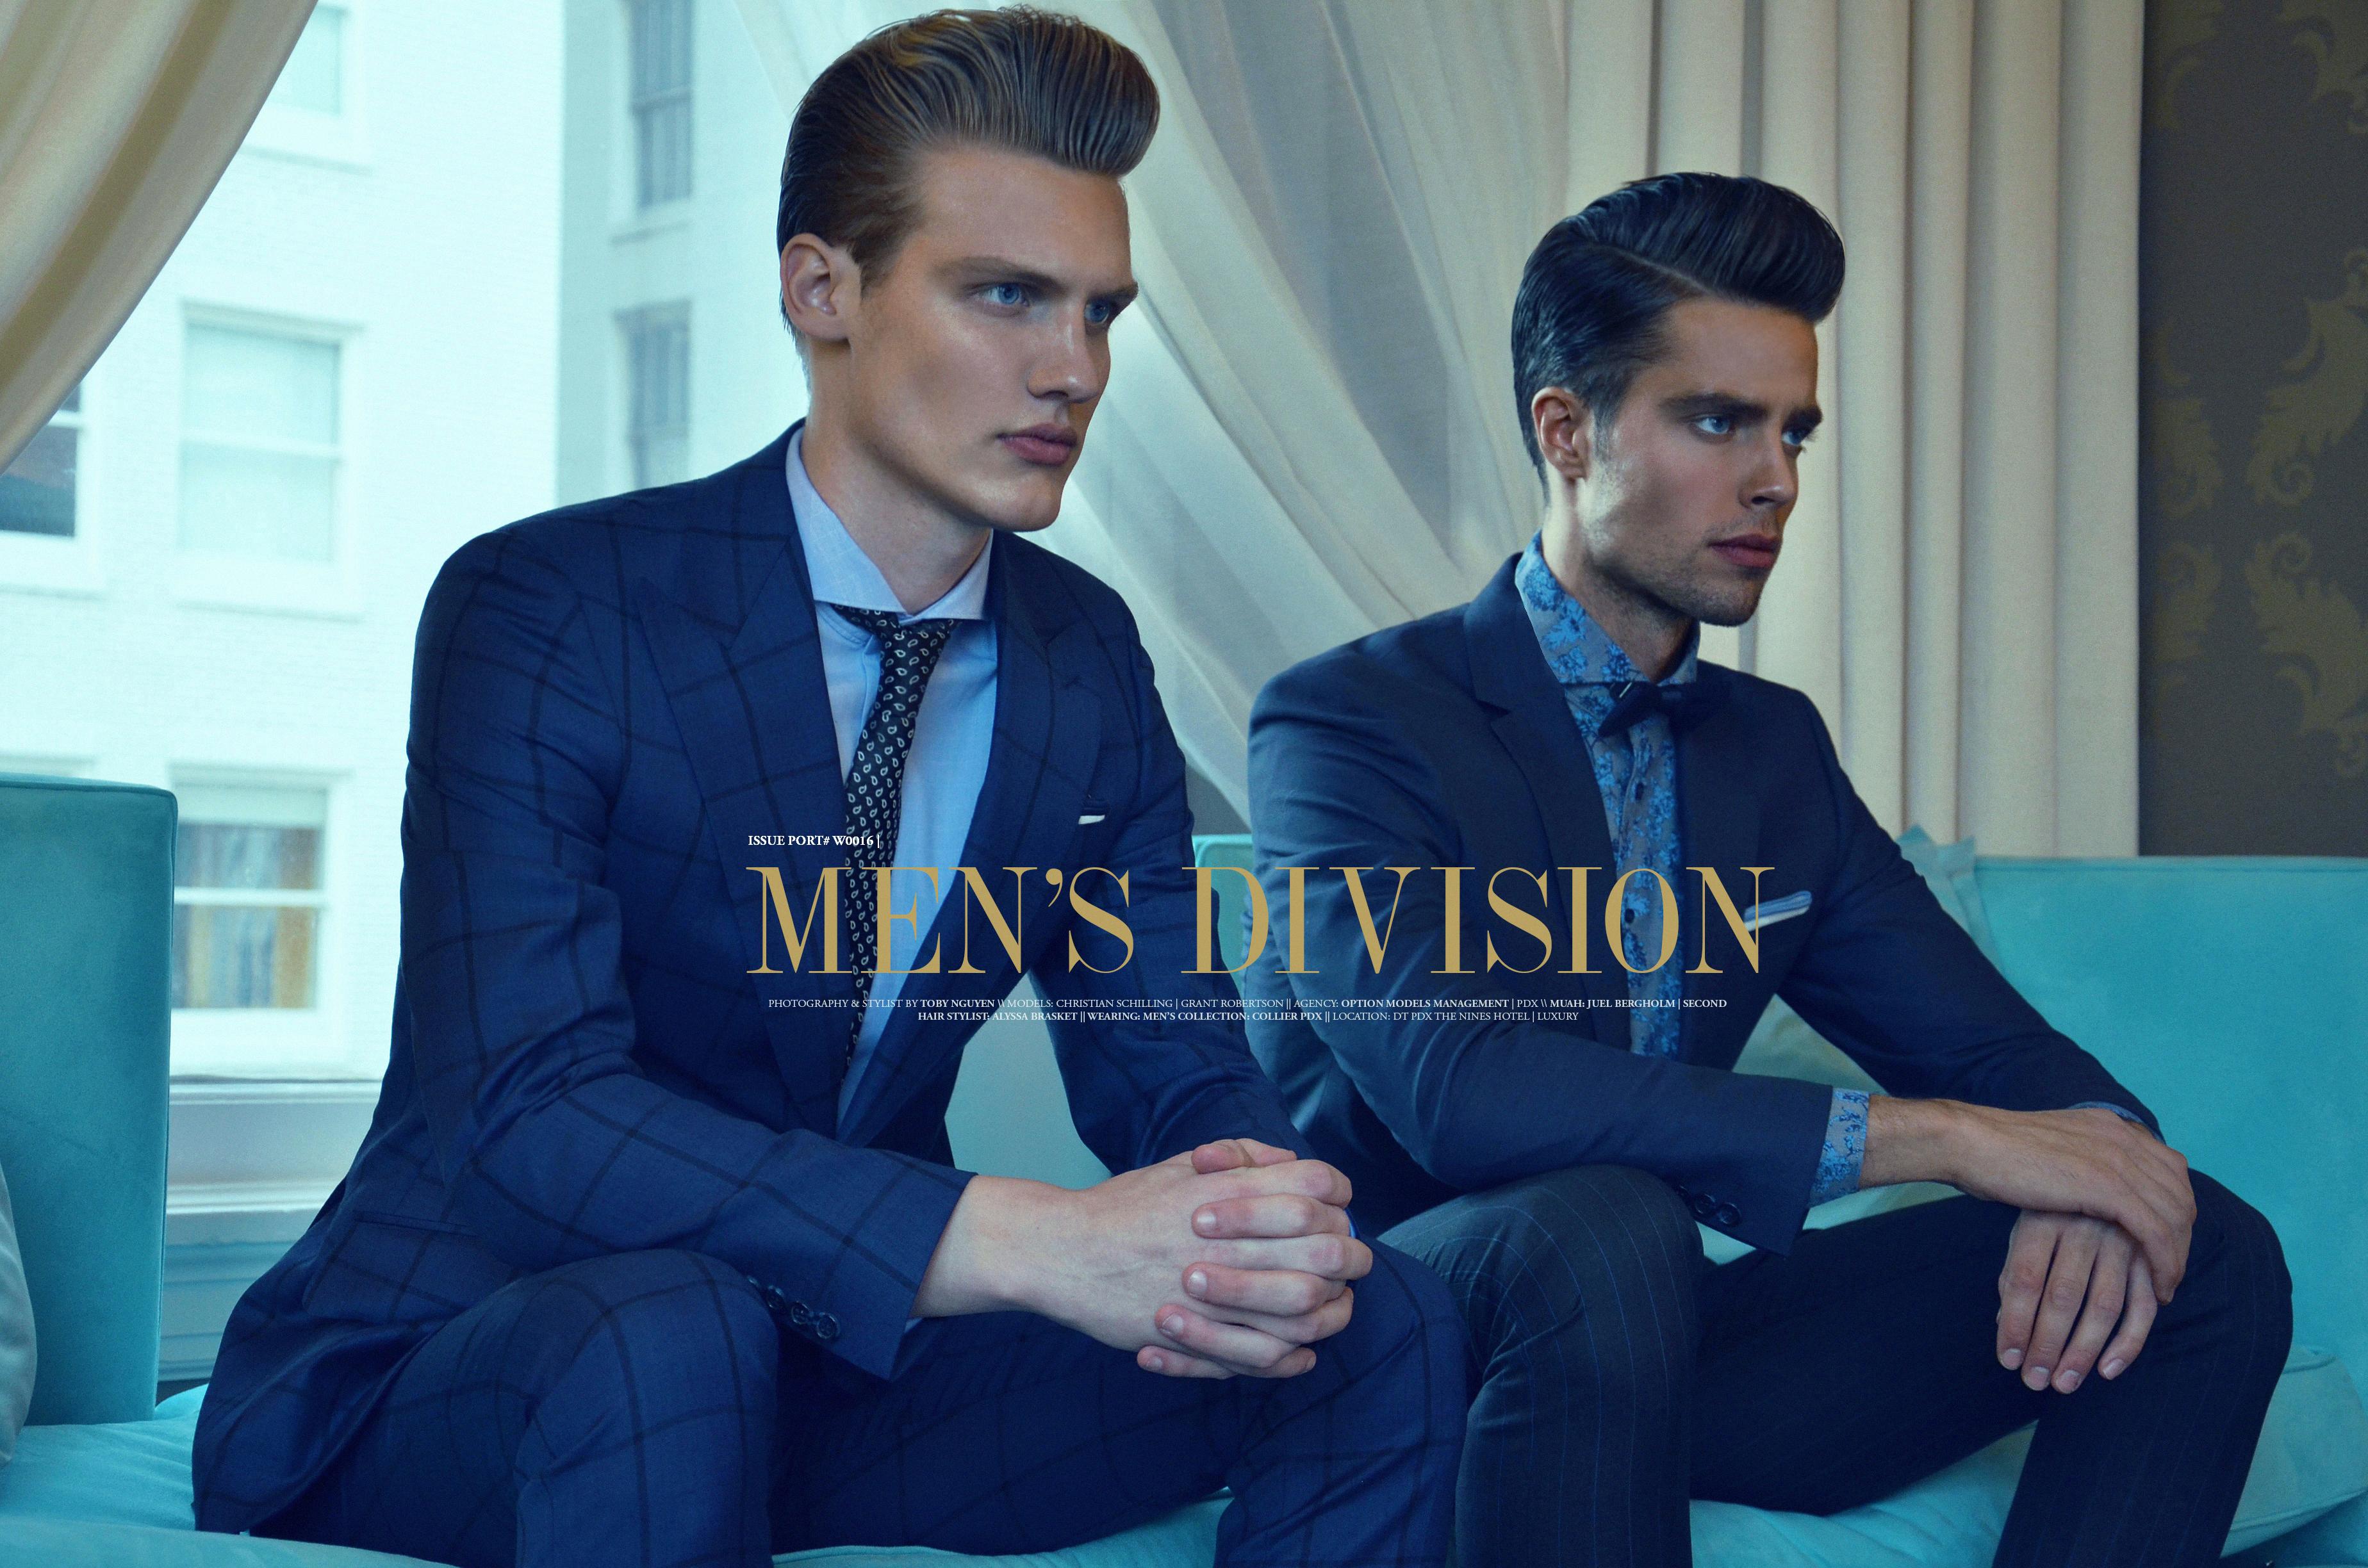 men's division